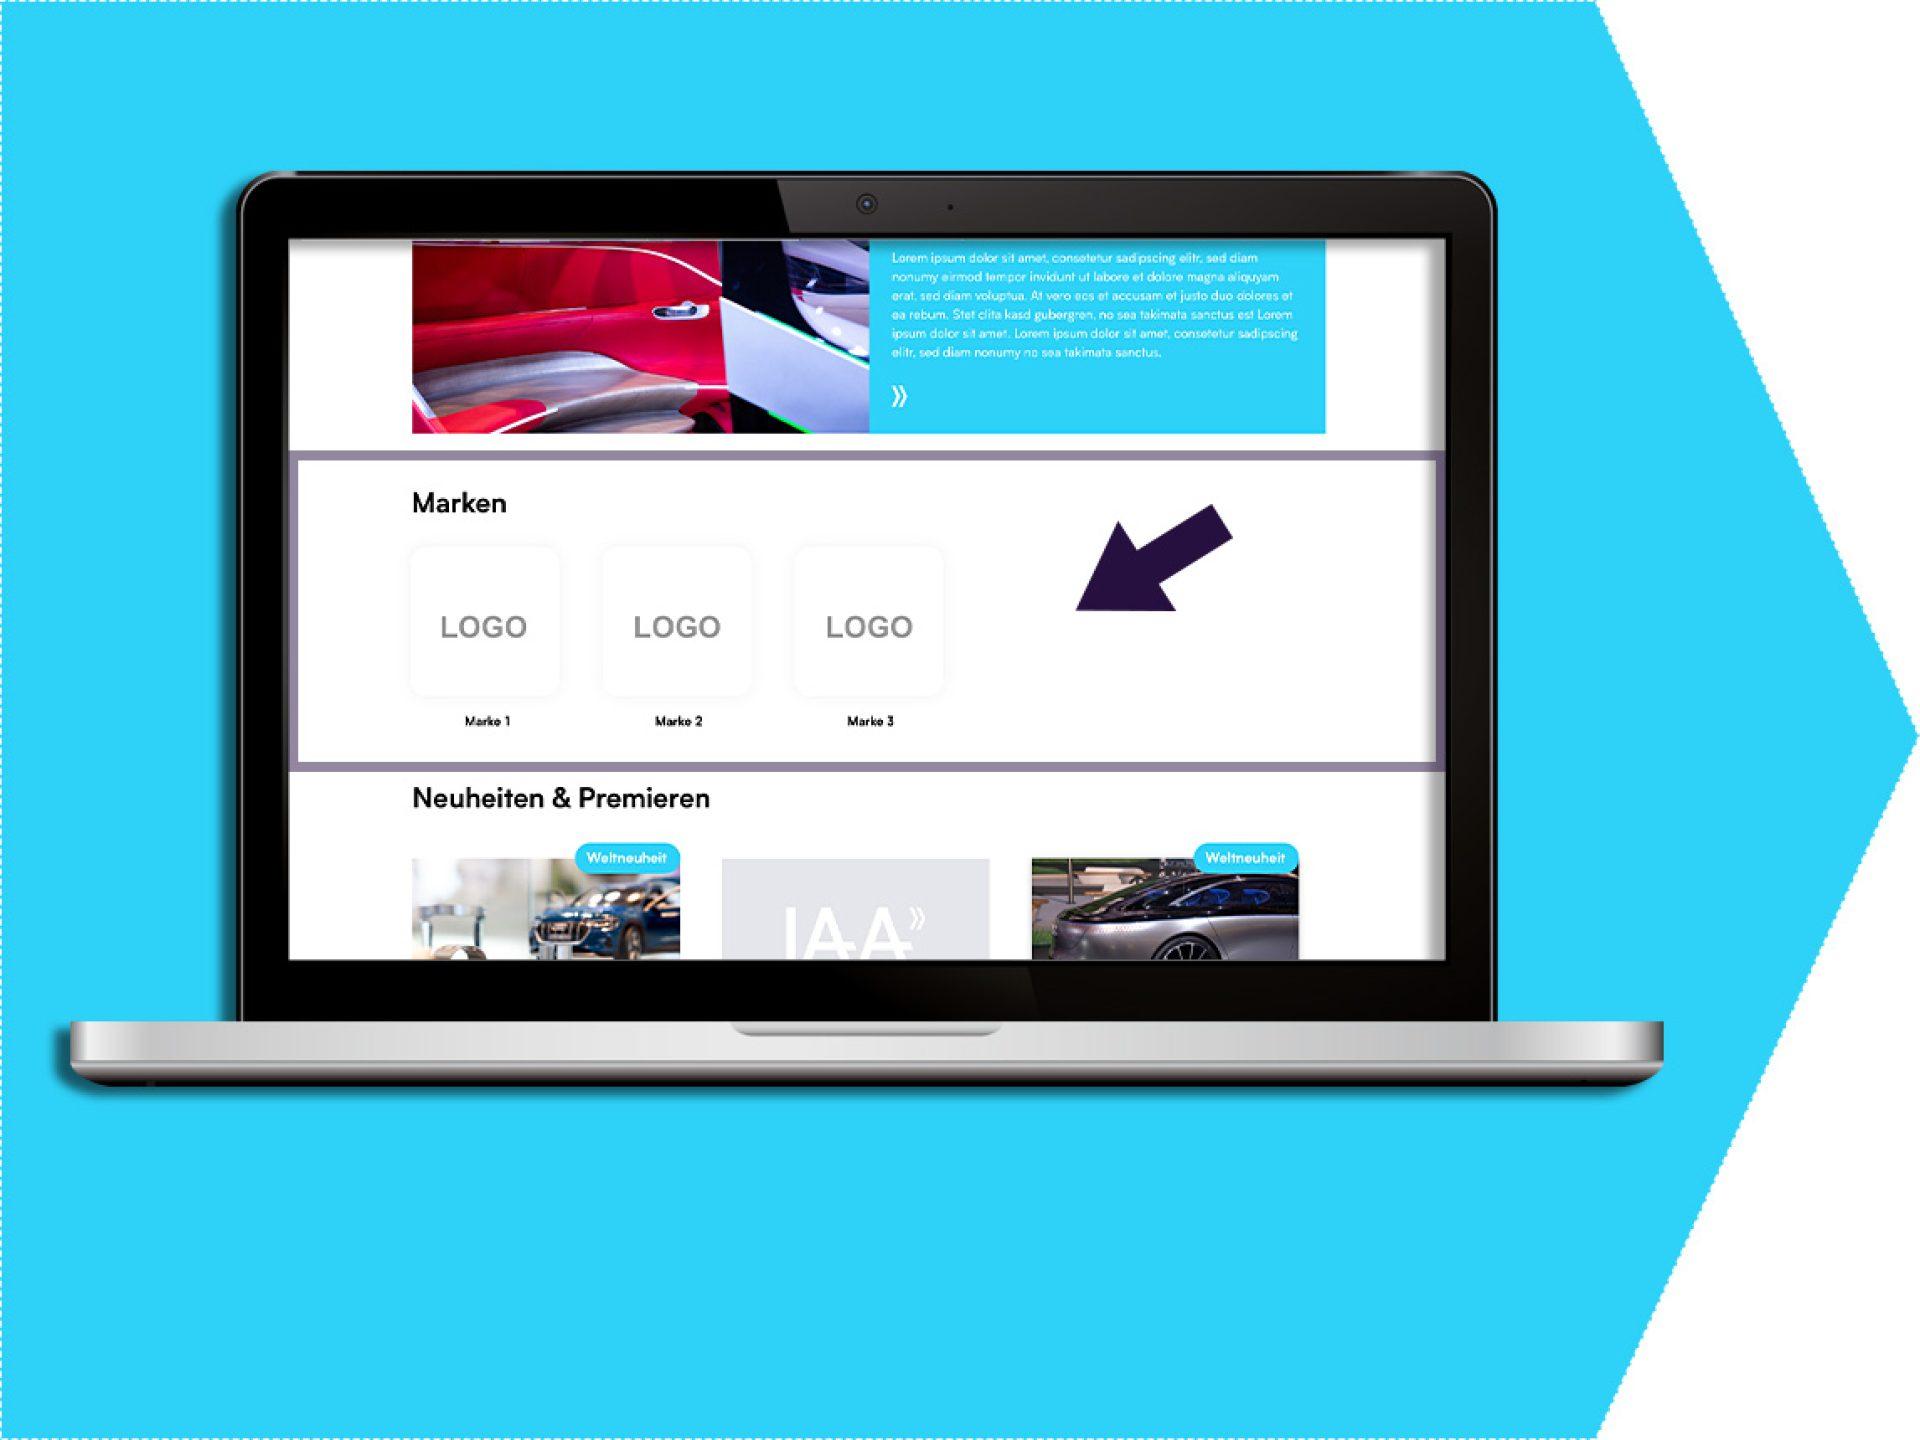 Brand logos on your exhibitor profile (exhibitor portal)